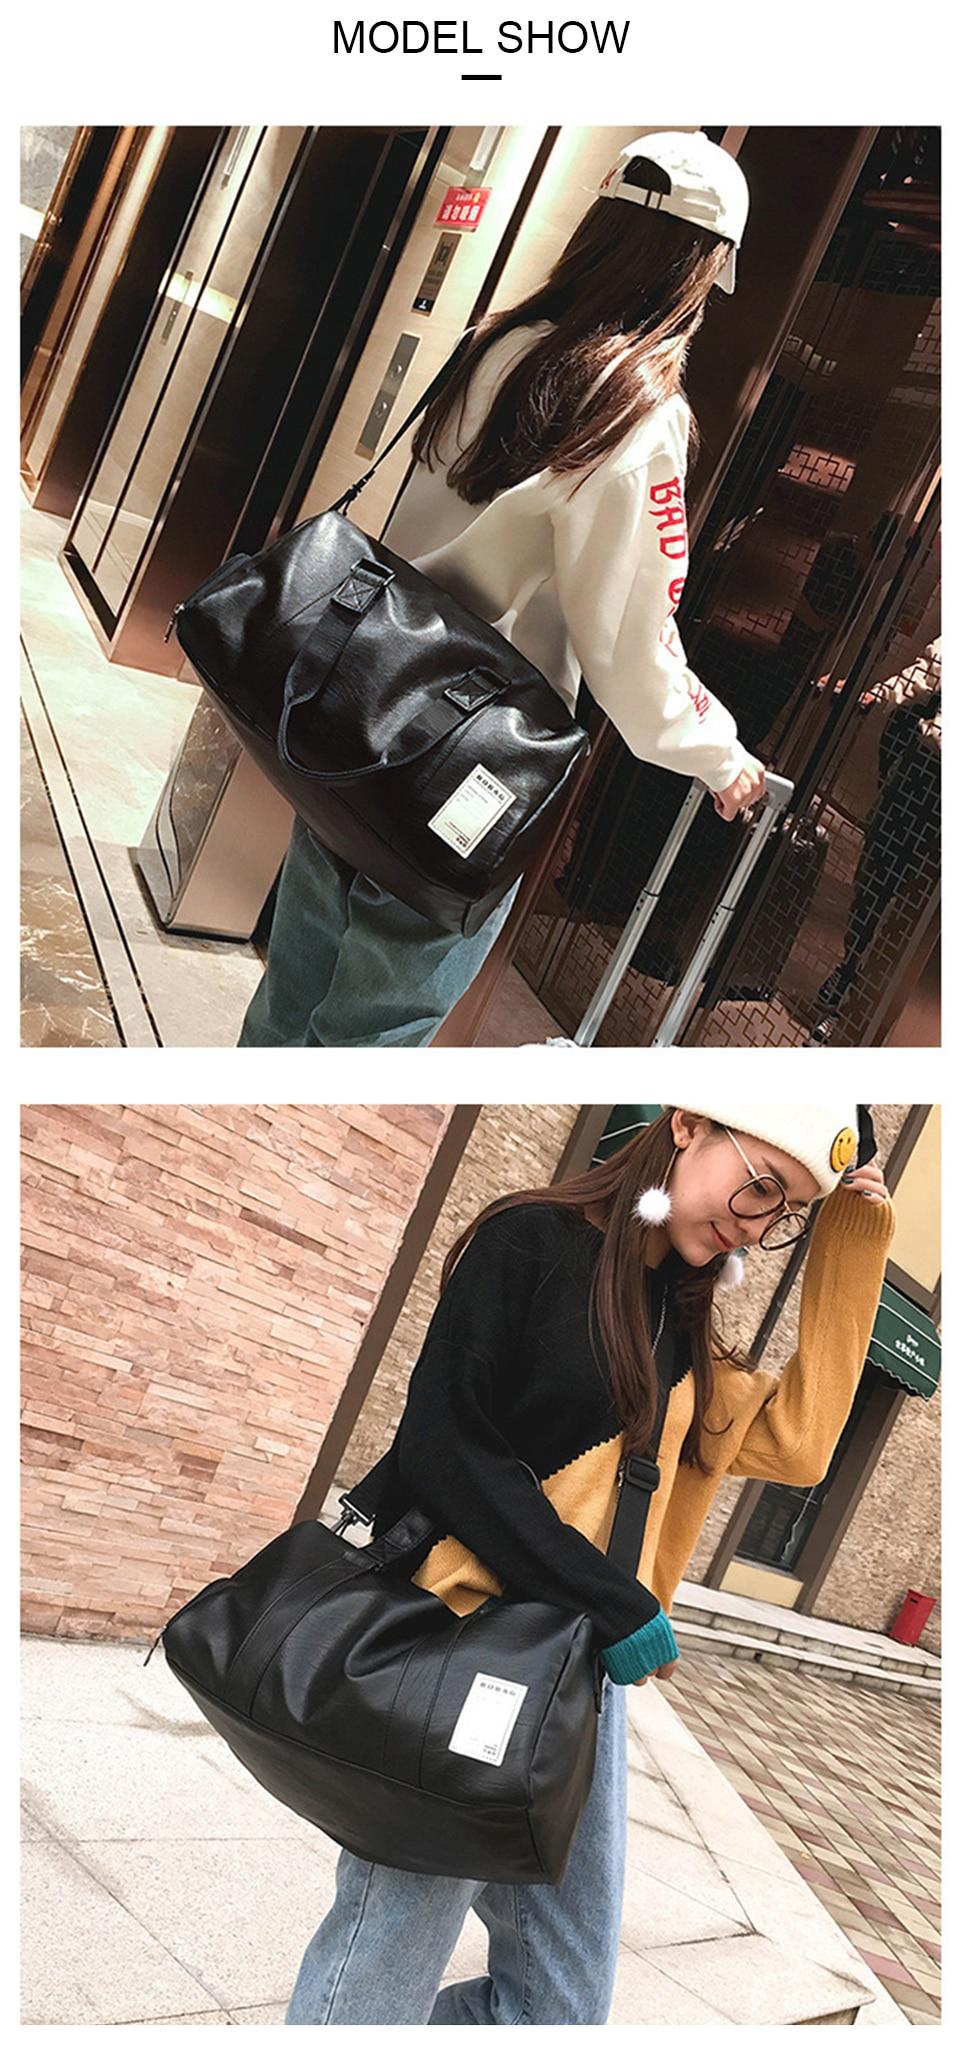 Travel-Bag-Overnight-Womens-Mens-Bags-Weekend-Hand-Shoulder-Duffle-Bag-Traveling-Sports-Gym-Girls-Short-Trip-Big-Large-Bolsas_08